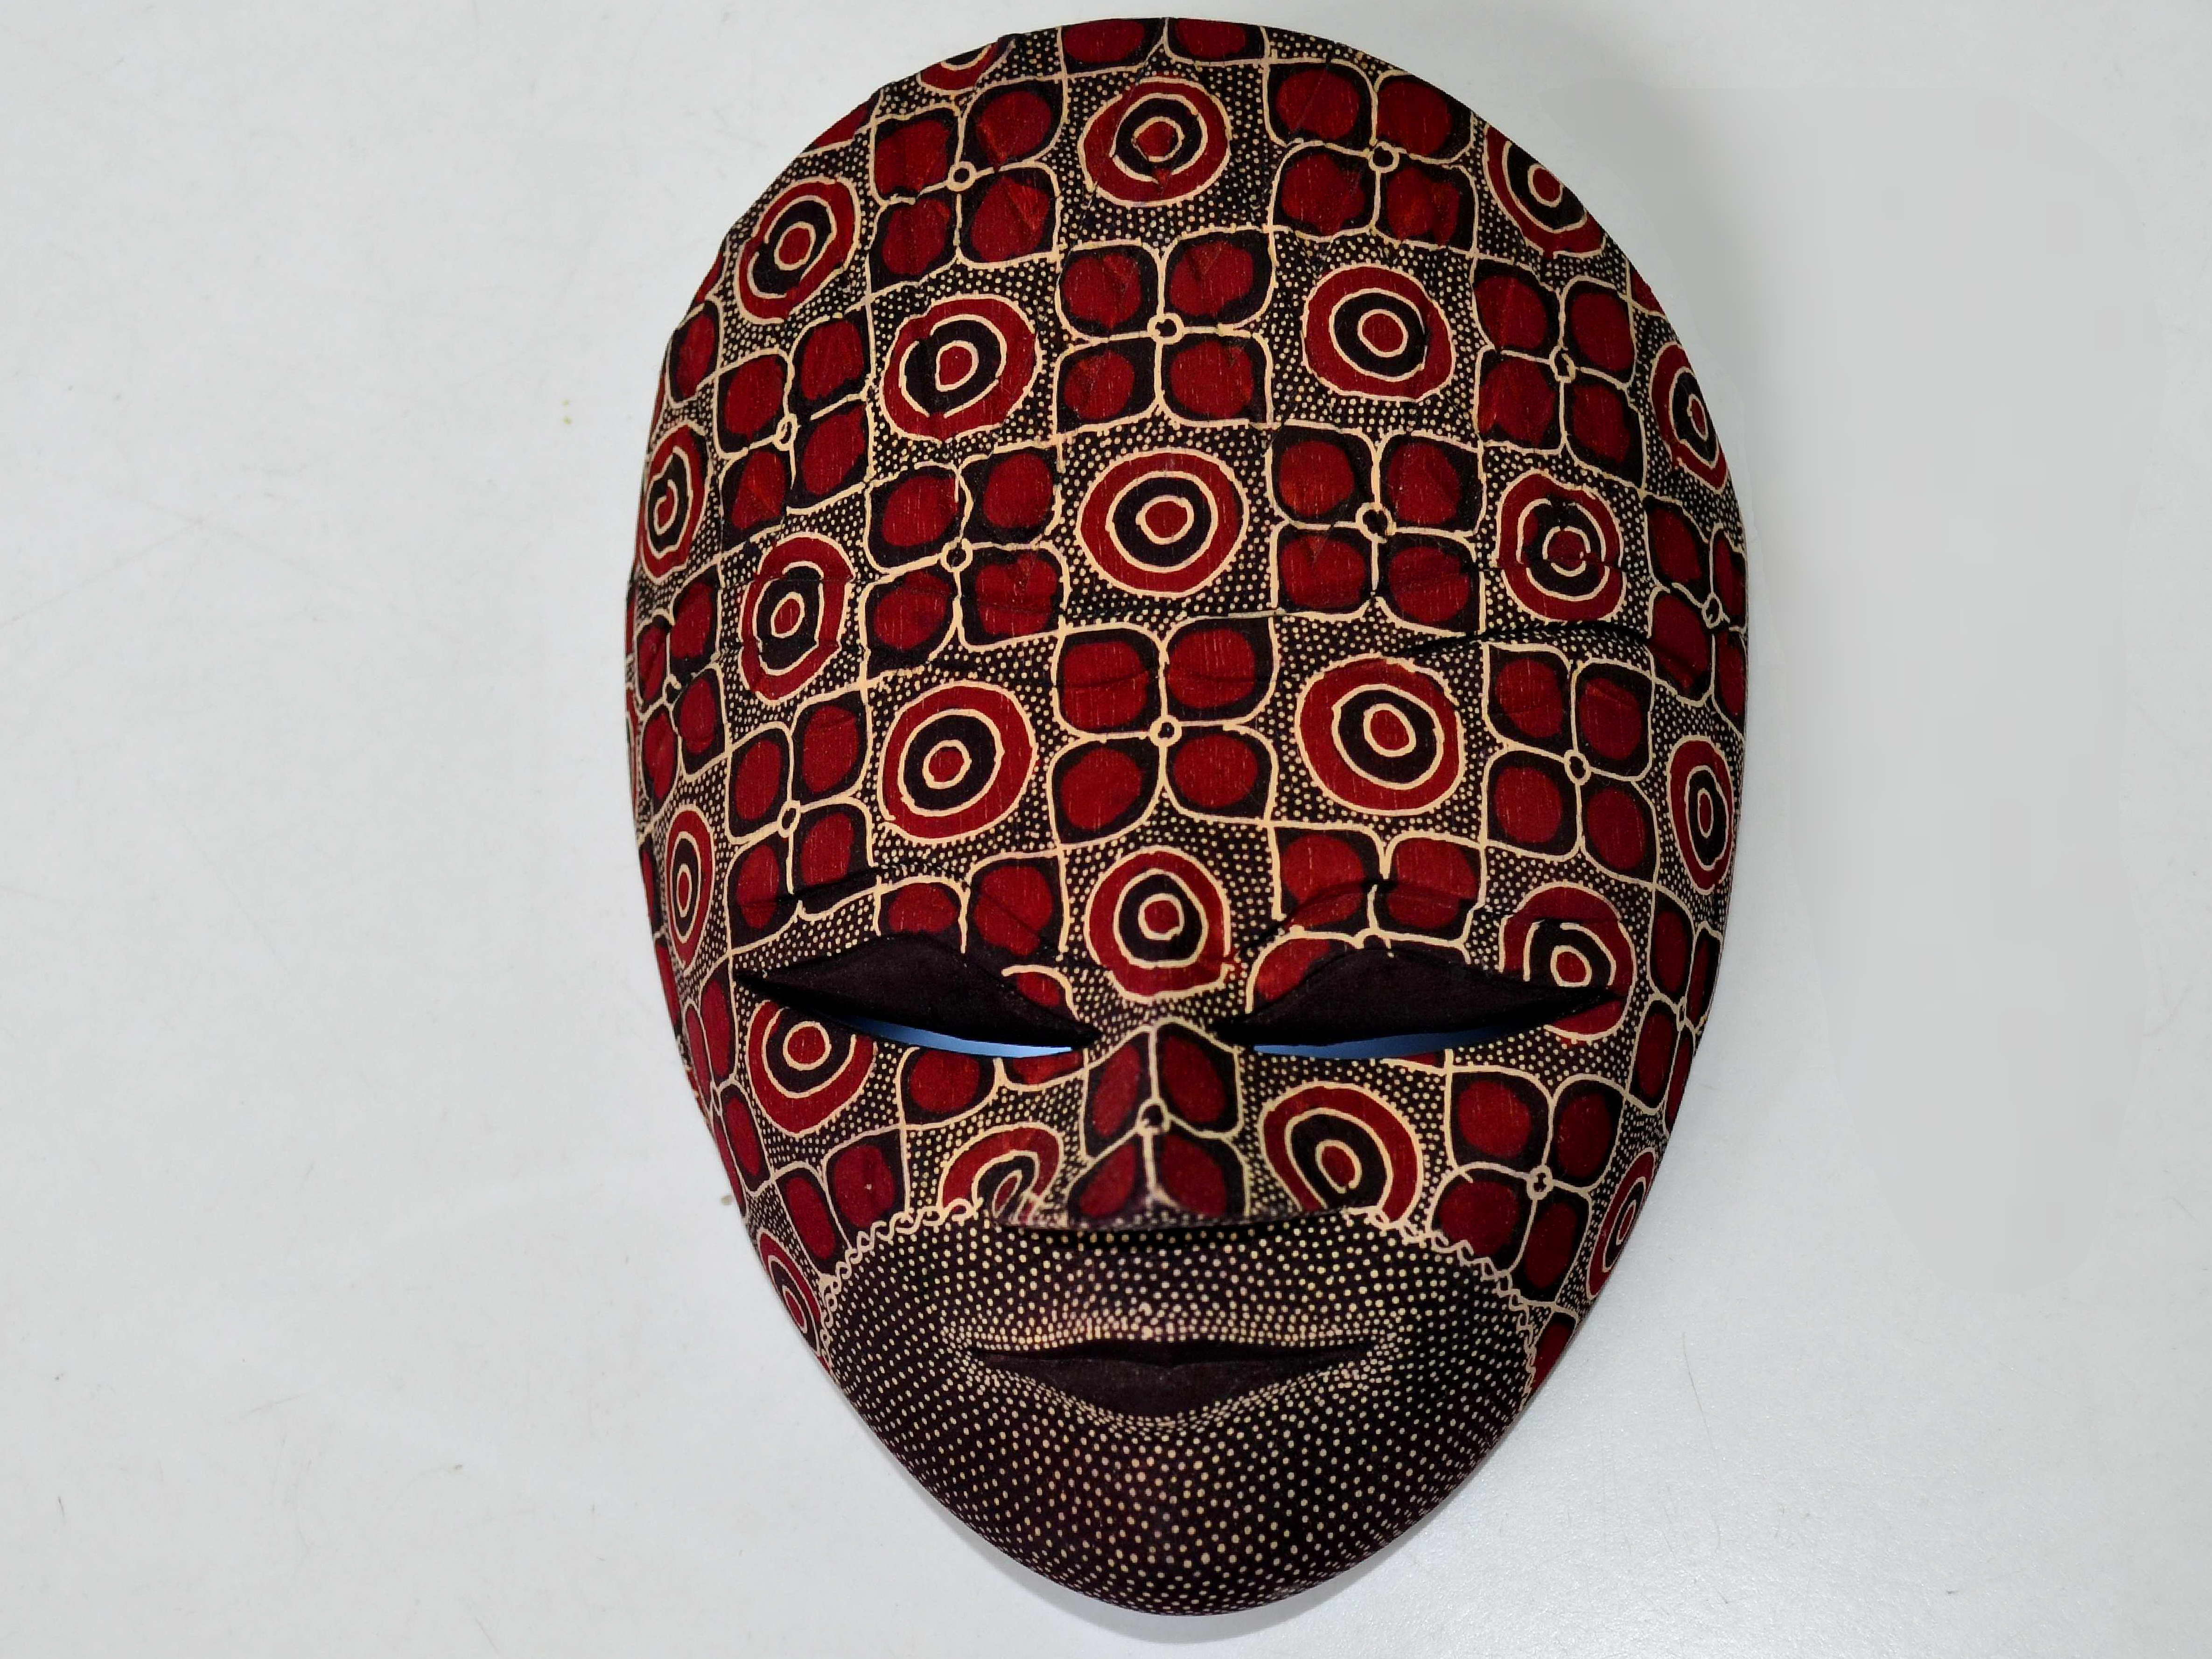 Free photograph; artistic, decorative, mask, wall